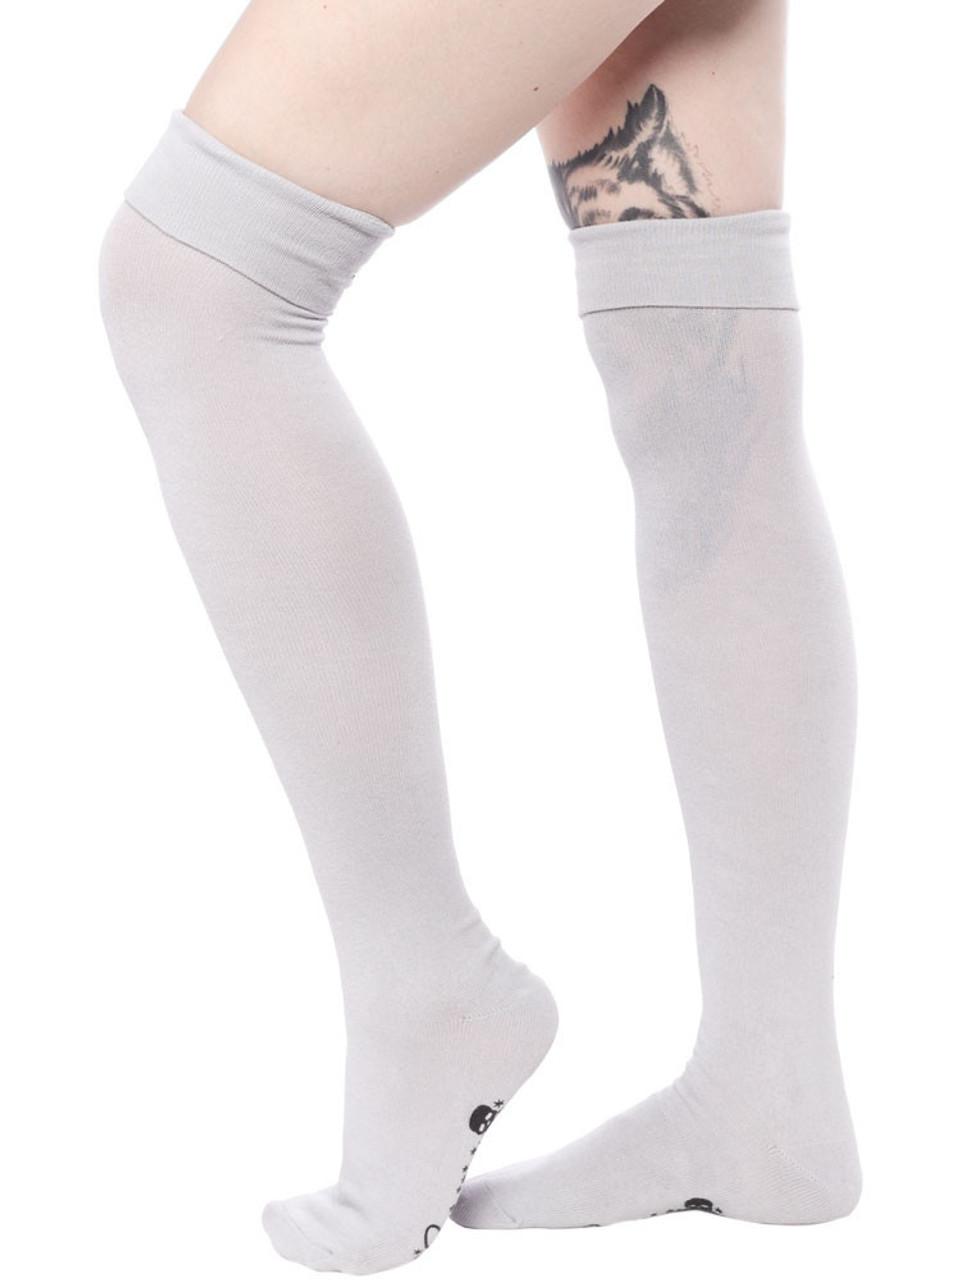 88cfc4e08 Sourpuss Gray Foldover Socks - Suicide Glam Australia